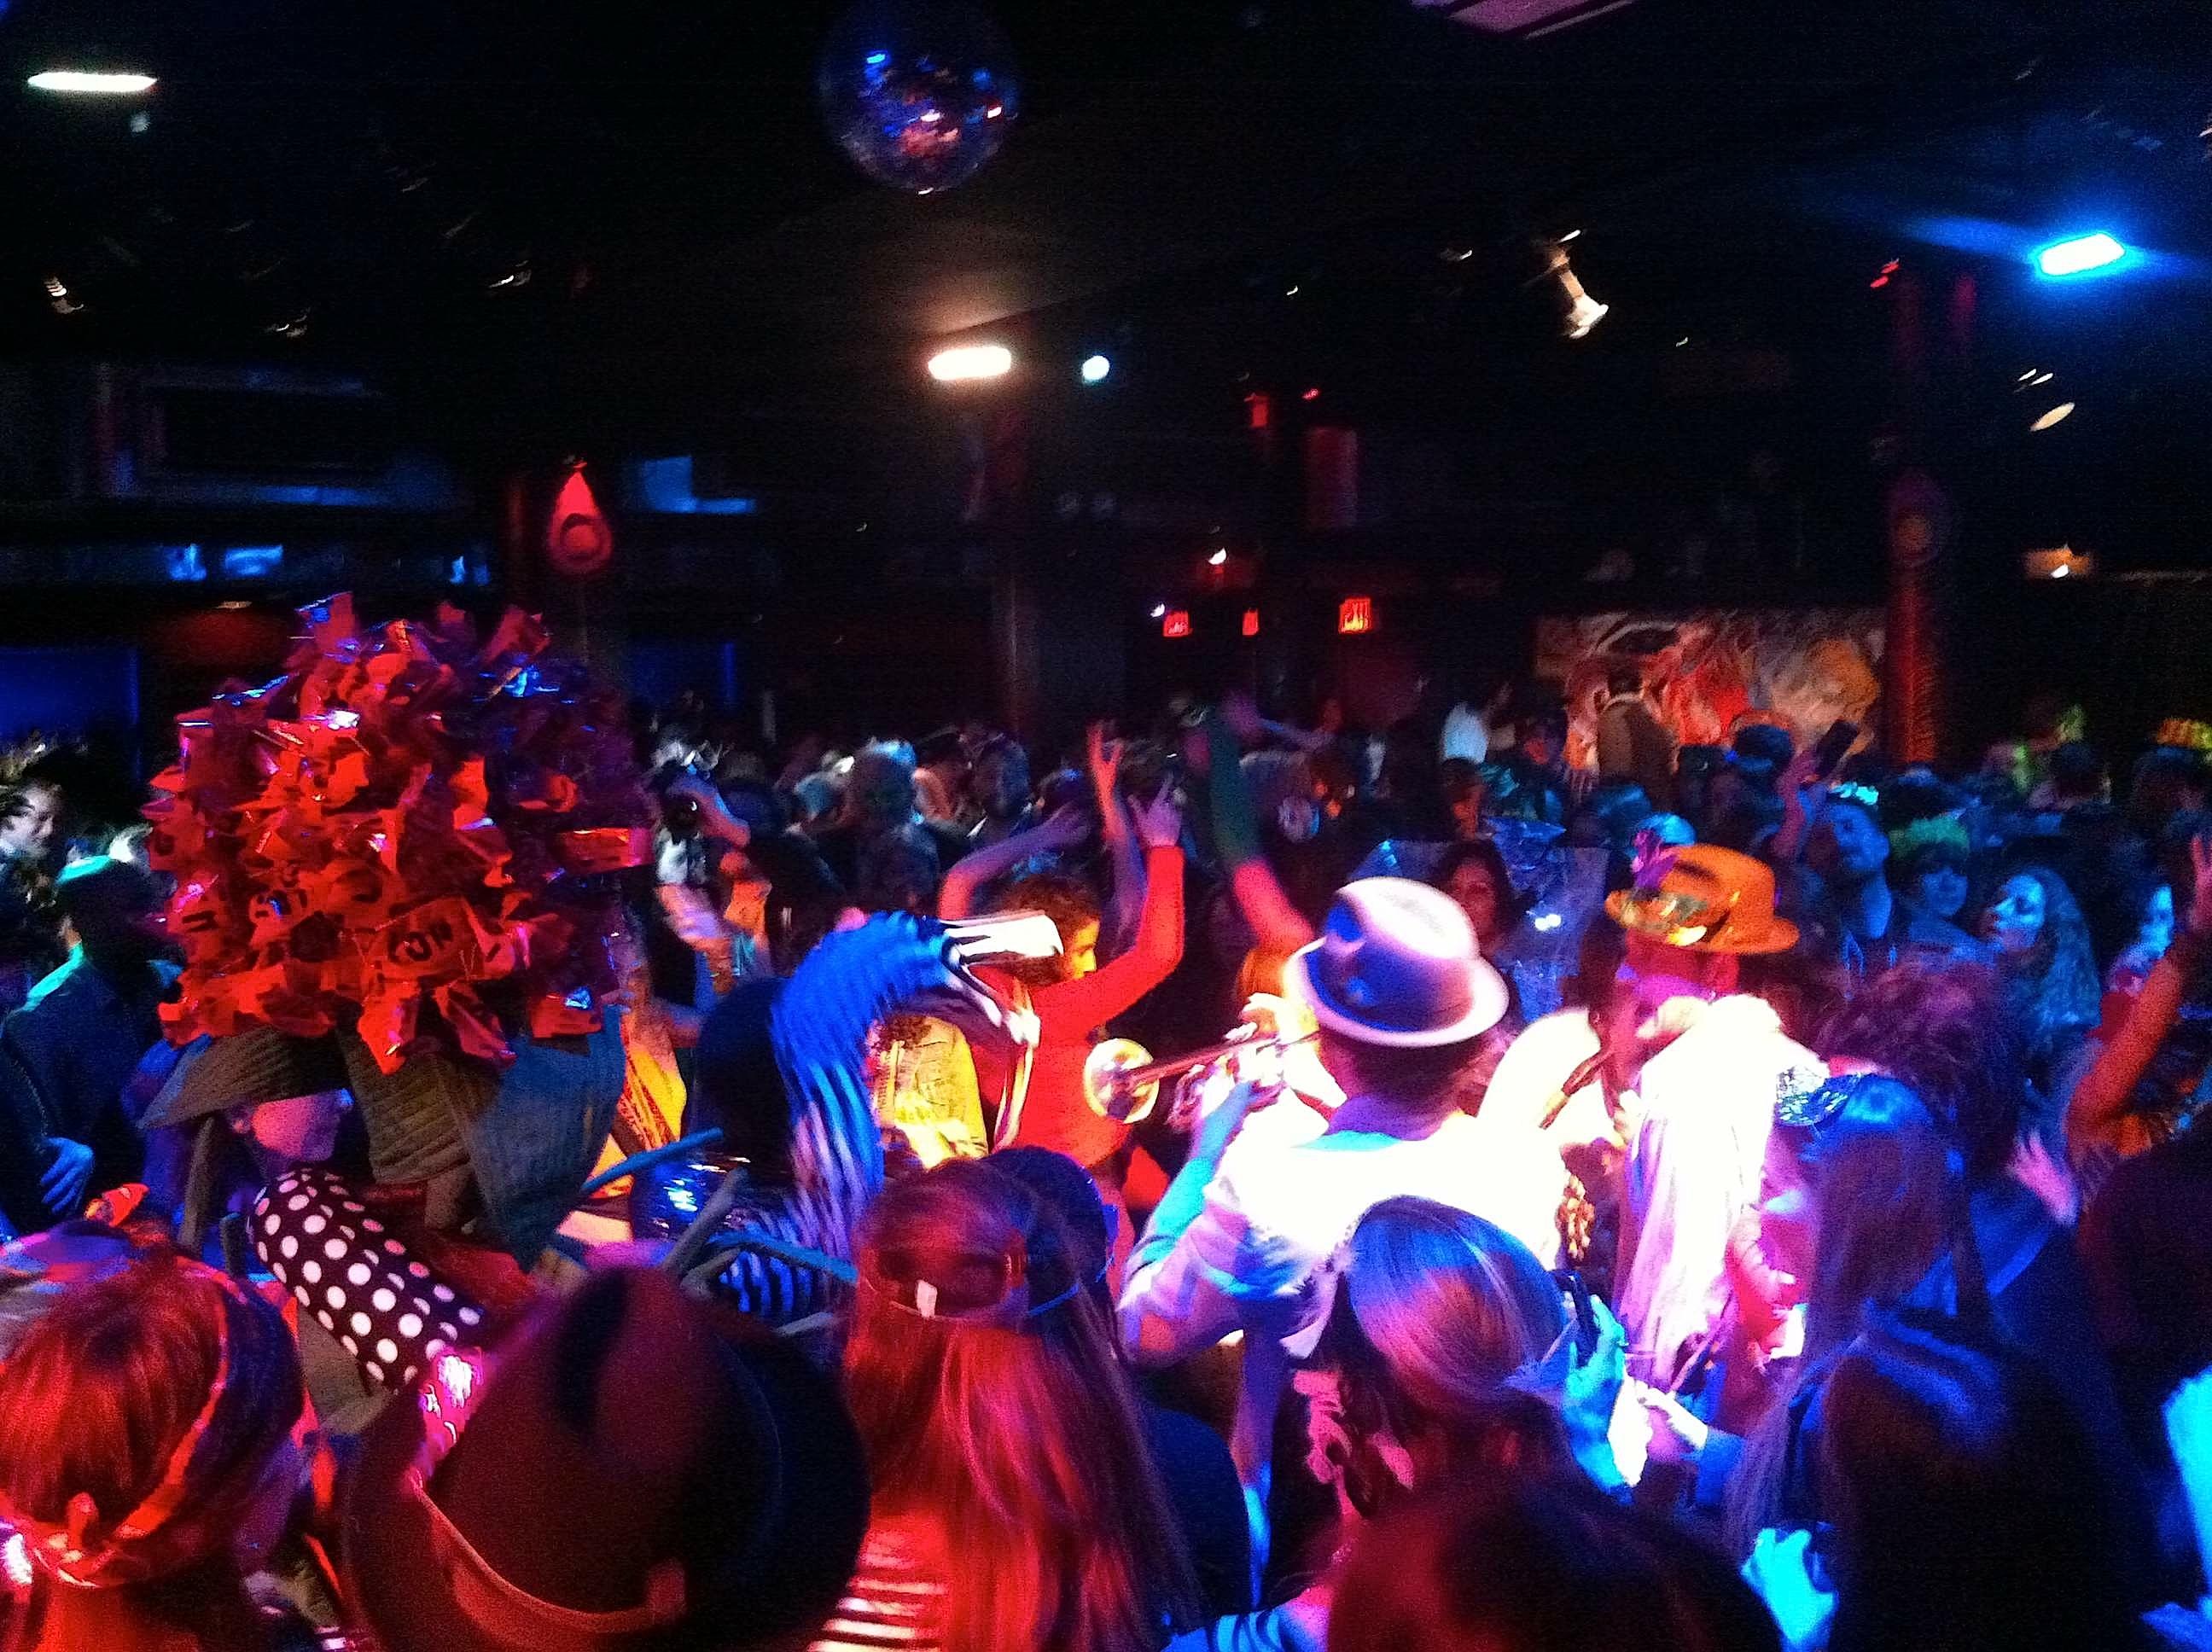 Niagara Falls Wallpaper Two Boots Celebrates Les Girl S Club Mardi Gras Style